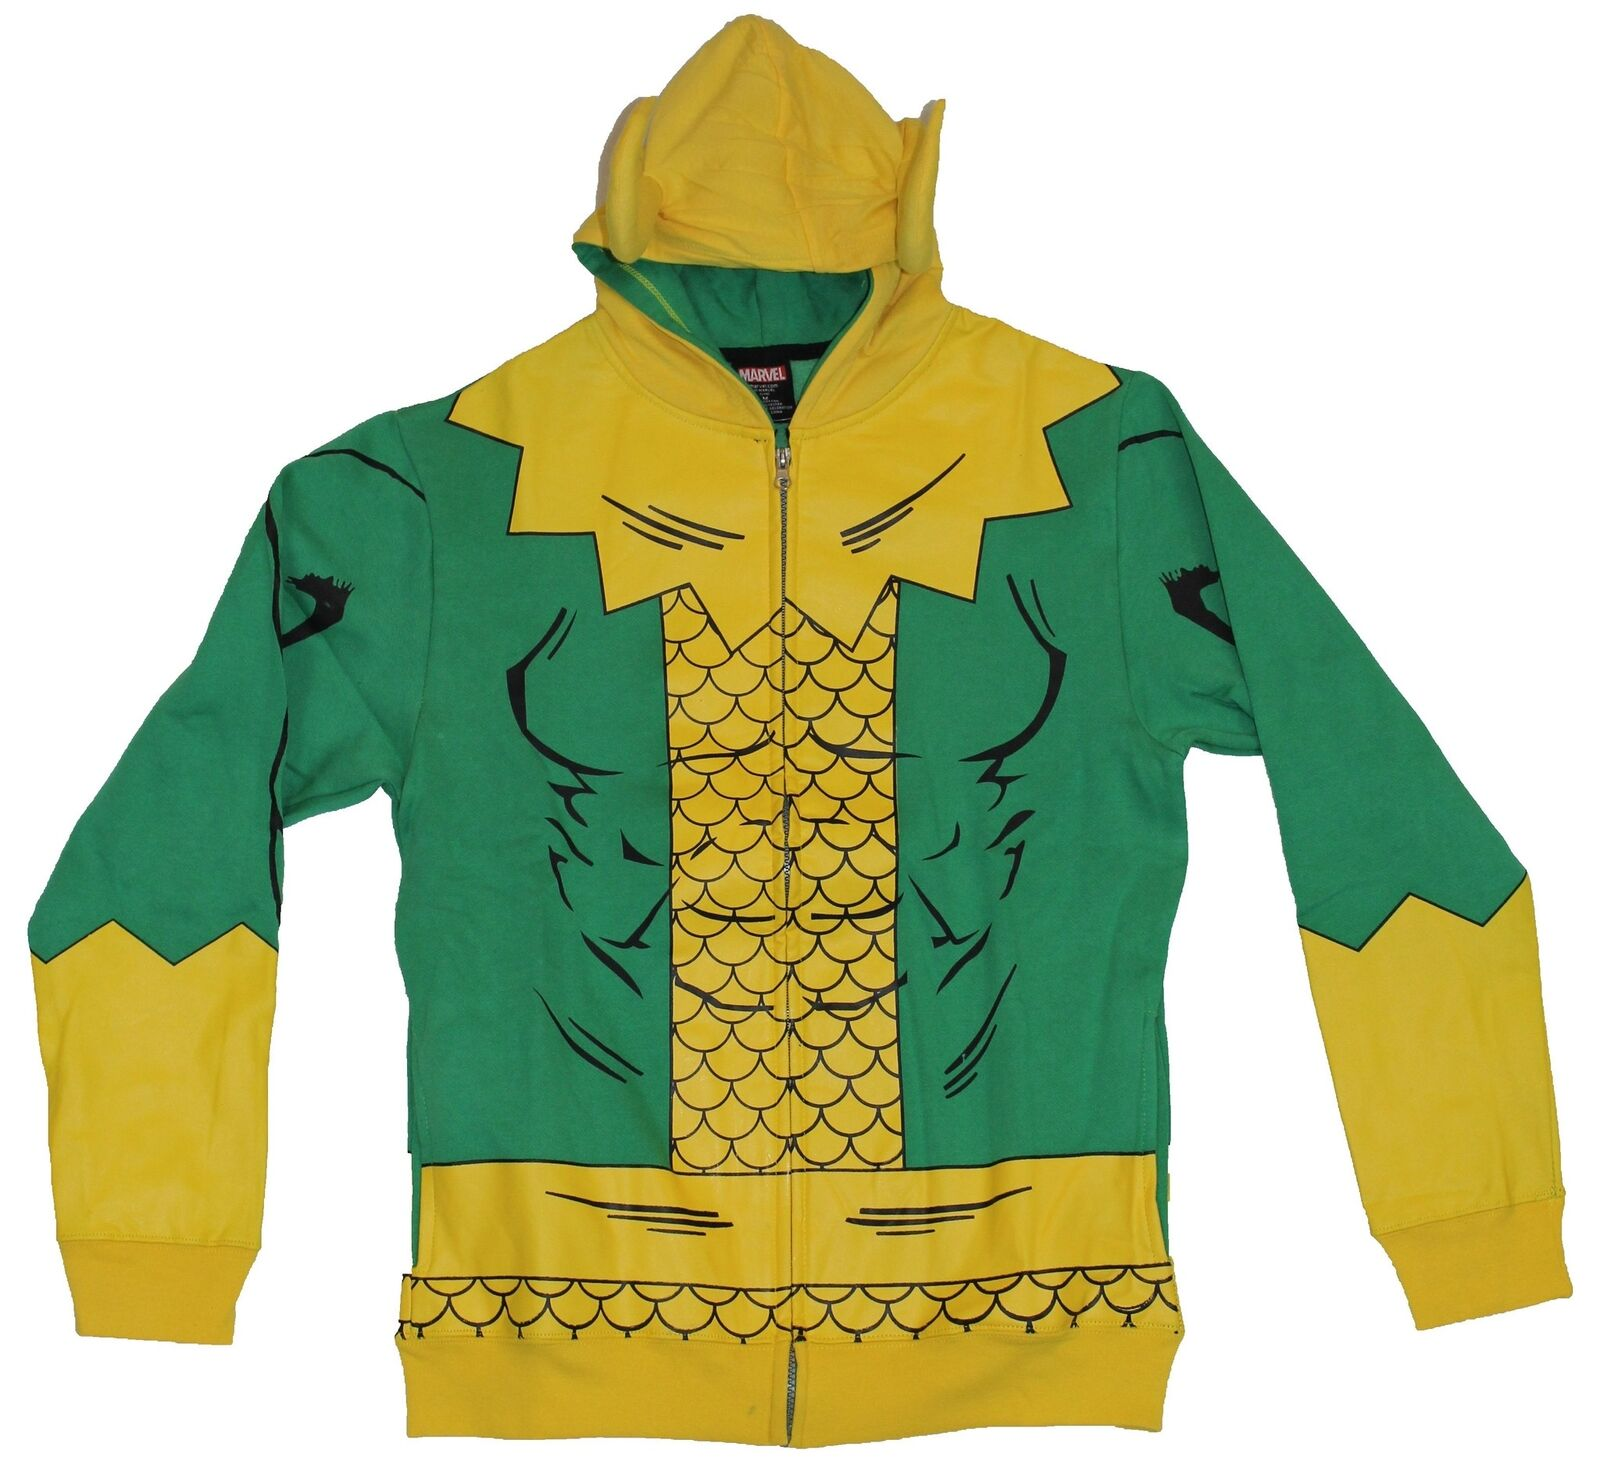 Thor (Marvel Comics) Loki  Herren Hoodie Sweatshirt - Simple Loki Costume W/ Horns